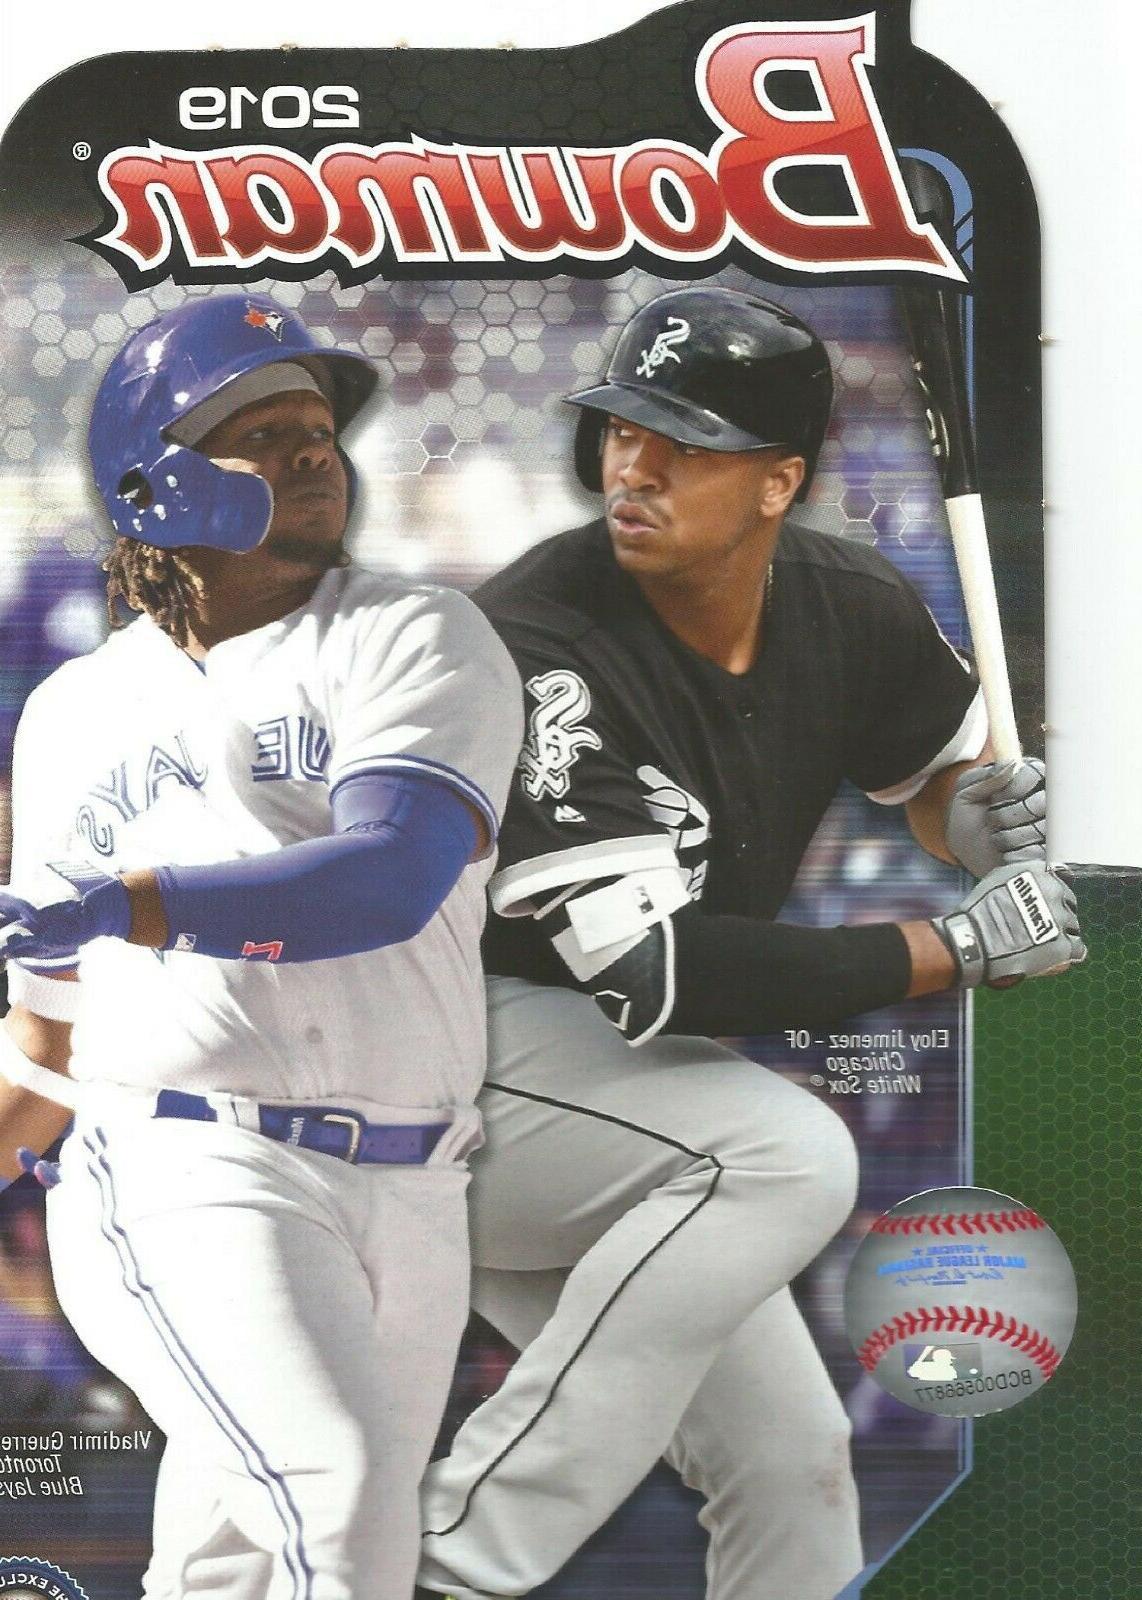 Alec Bohm 2019 Baseball Card